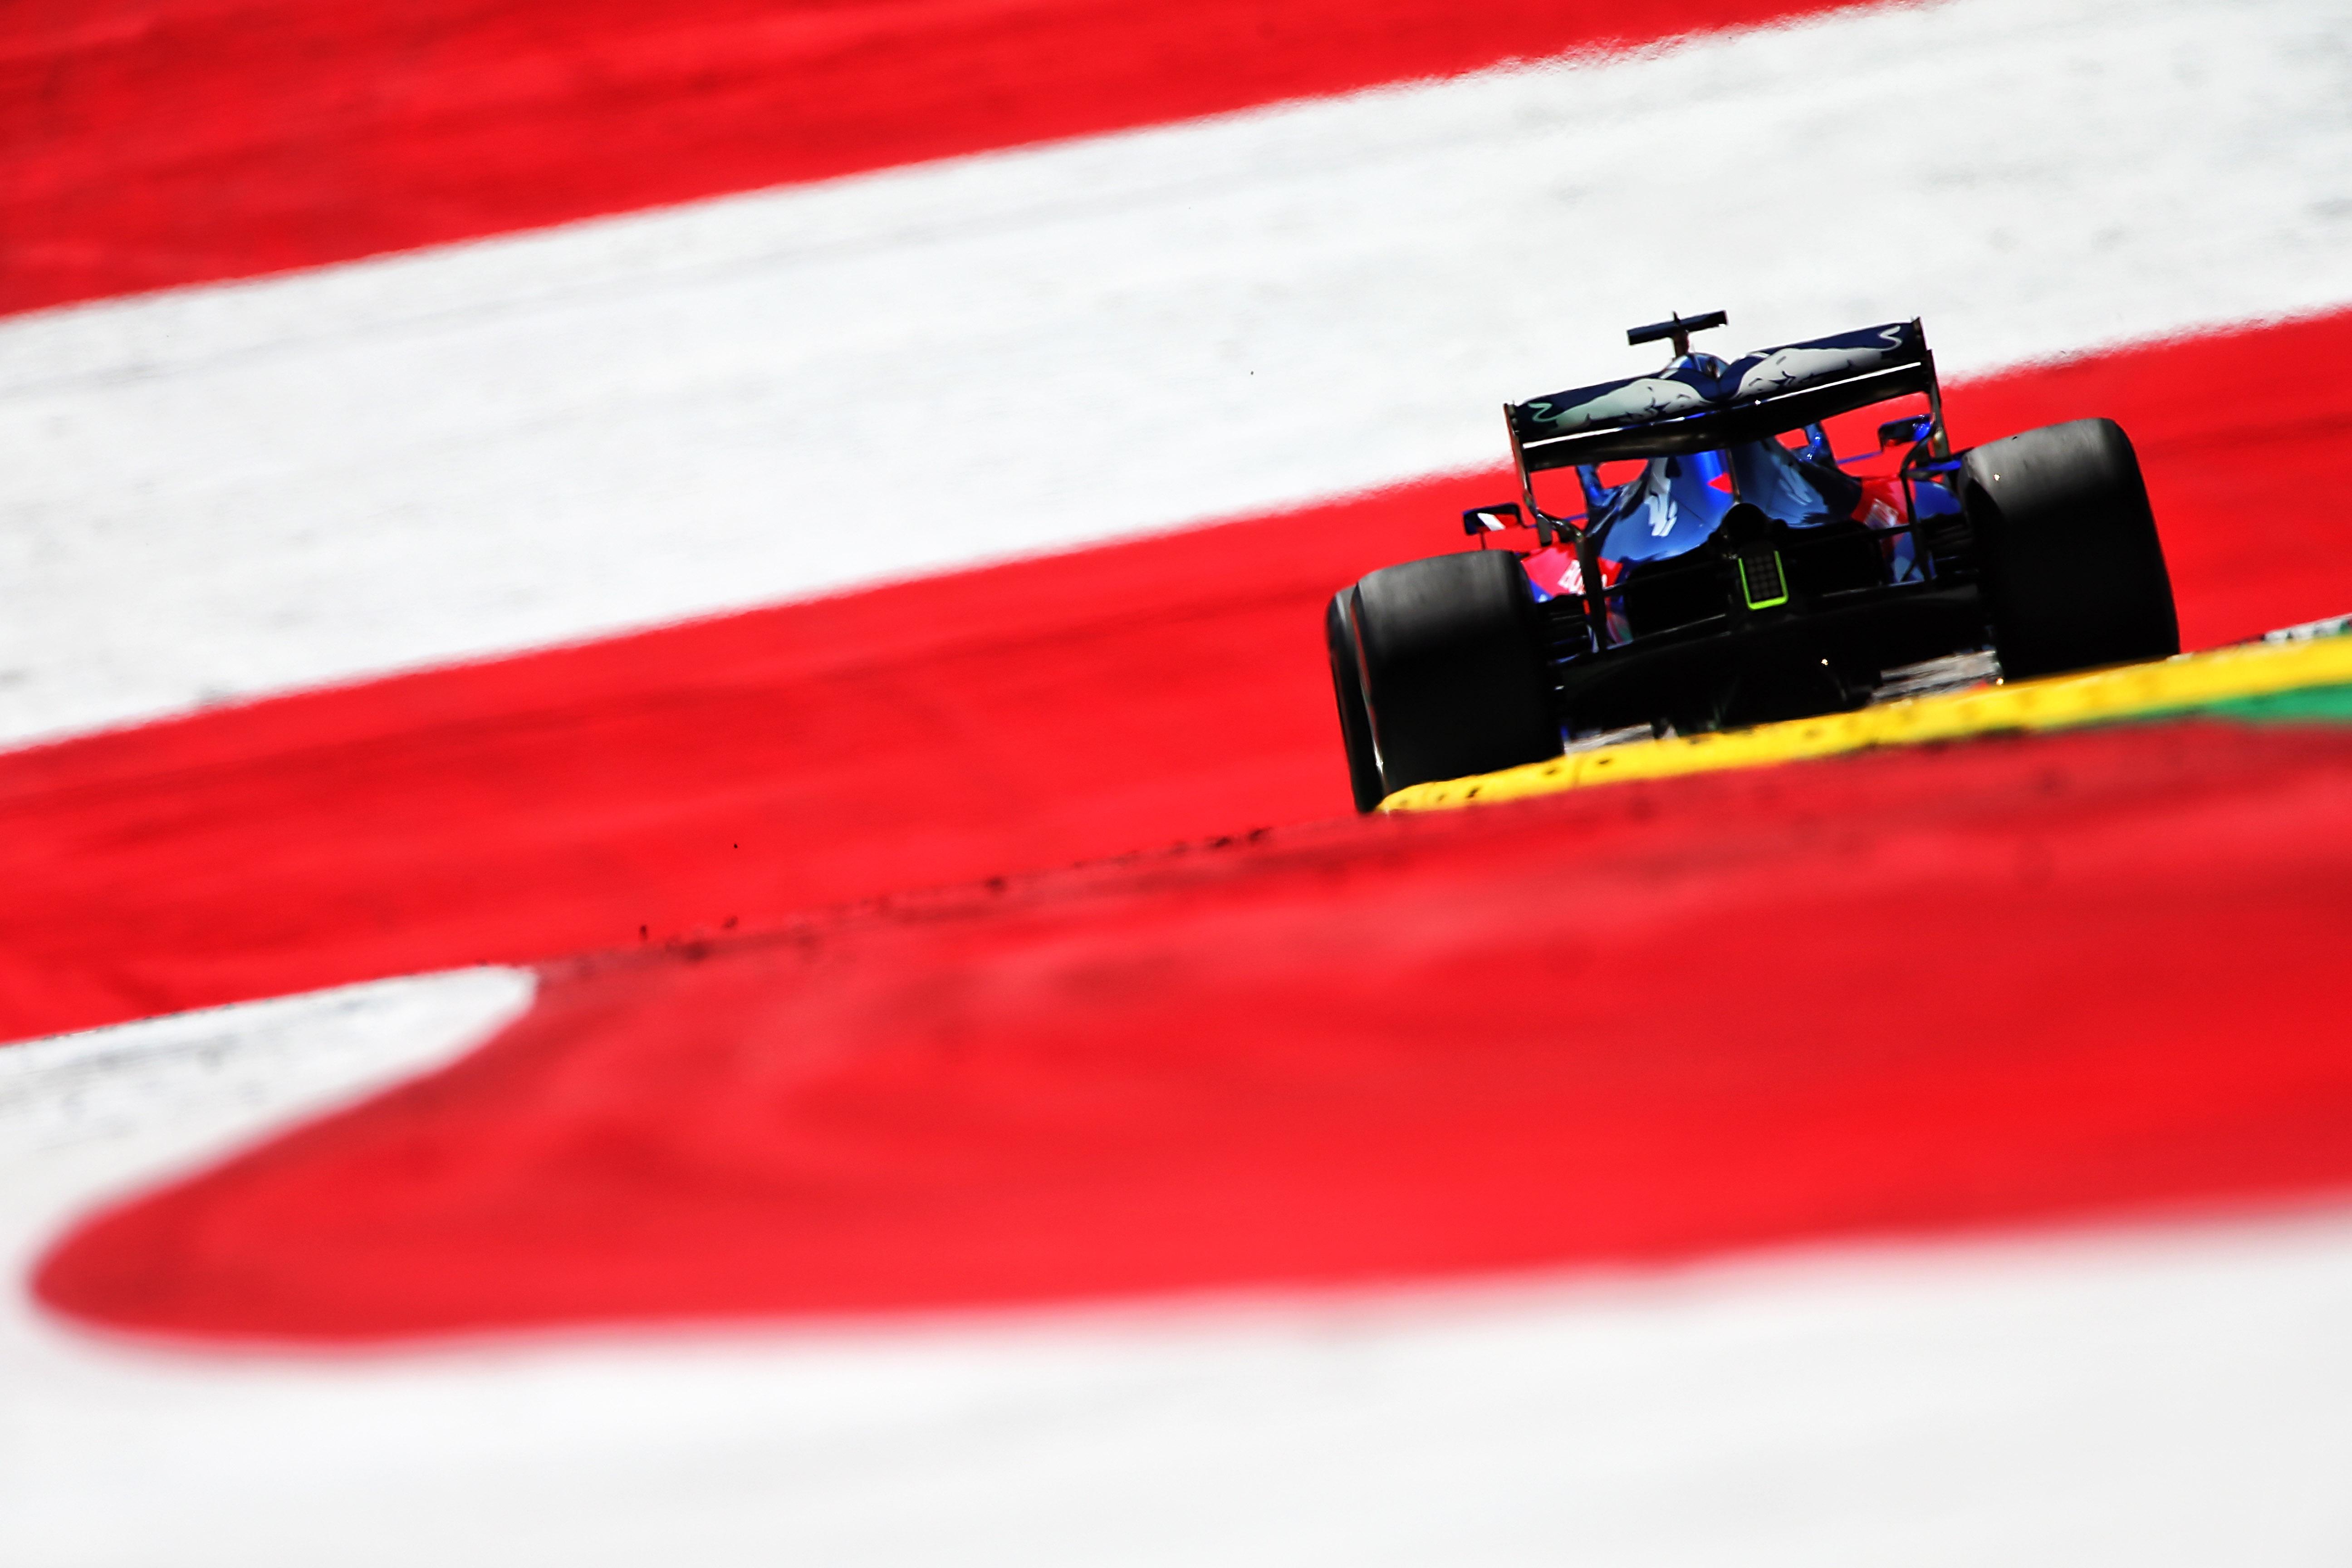 Daniil Kvyat Toro Rosso Austrian Grand Prix 2019